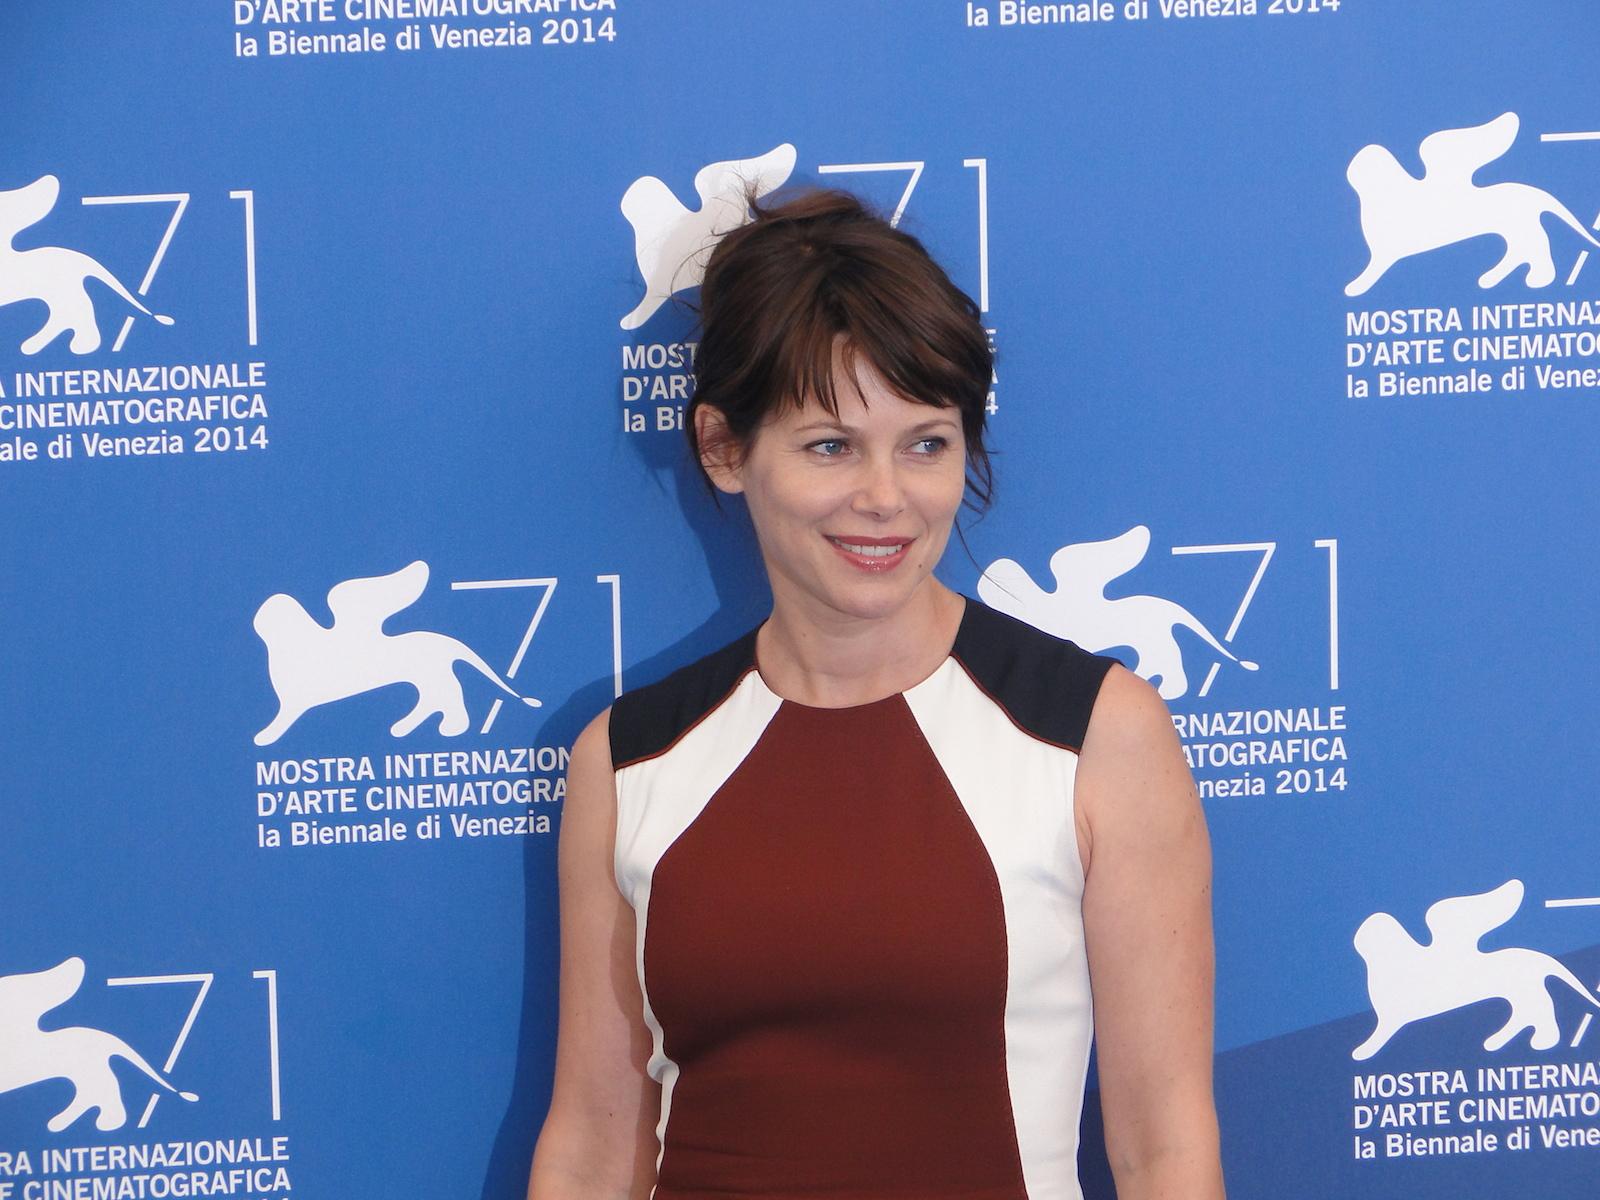 Venezia 2014: Barbora Bobulova sorride al photocall di Anime nere